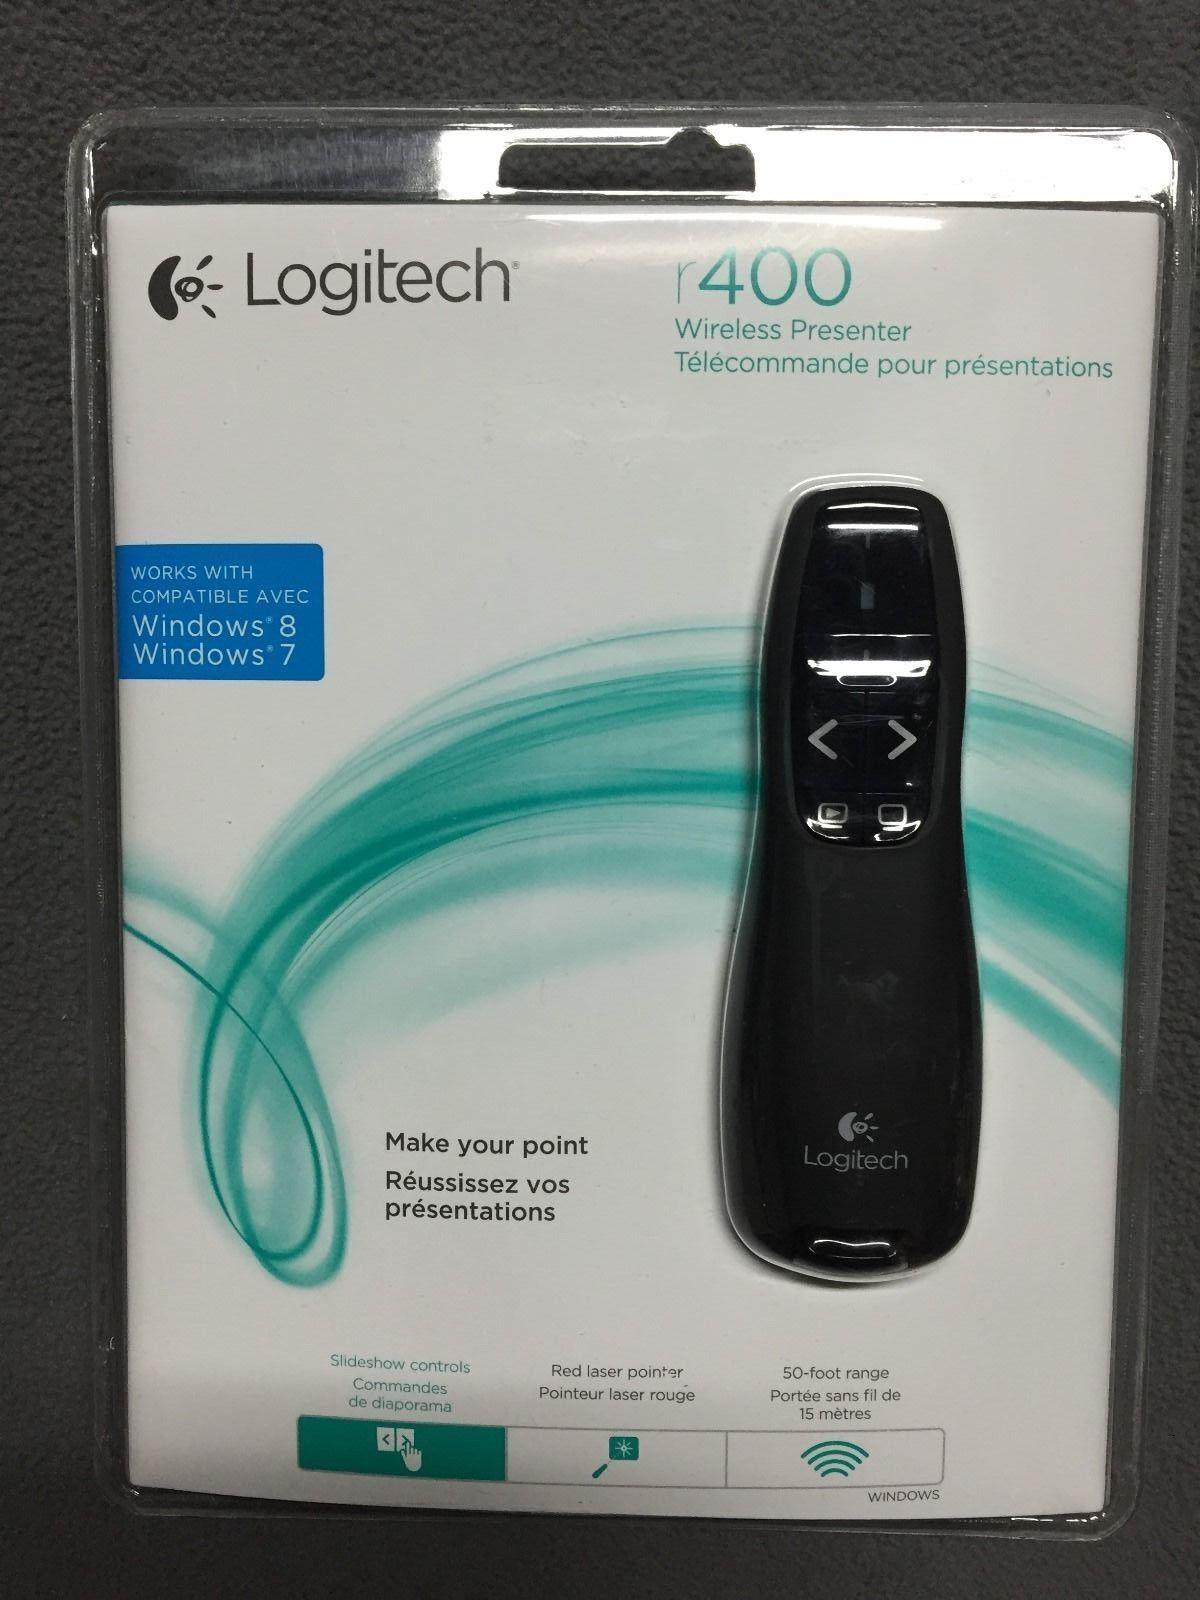 logitech wireless presenter r400 manual